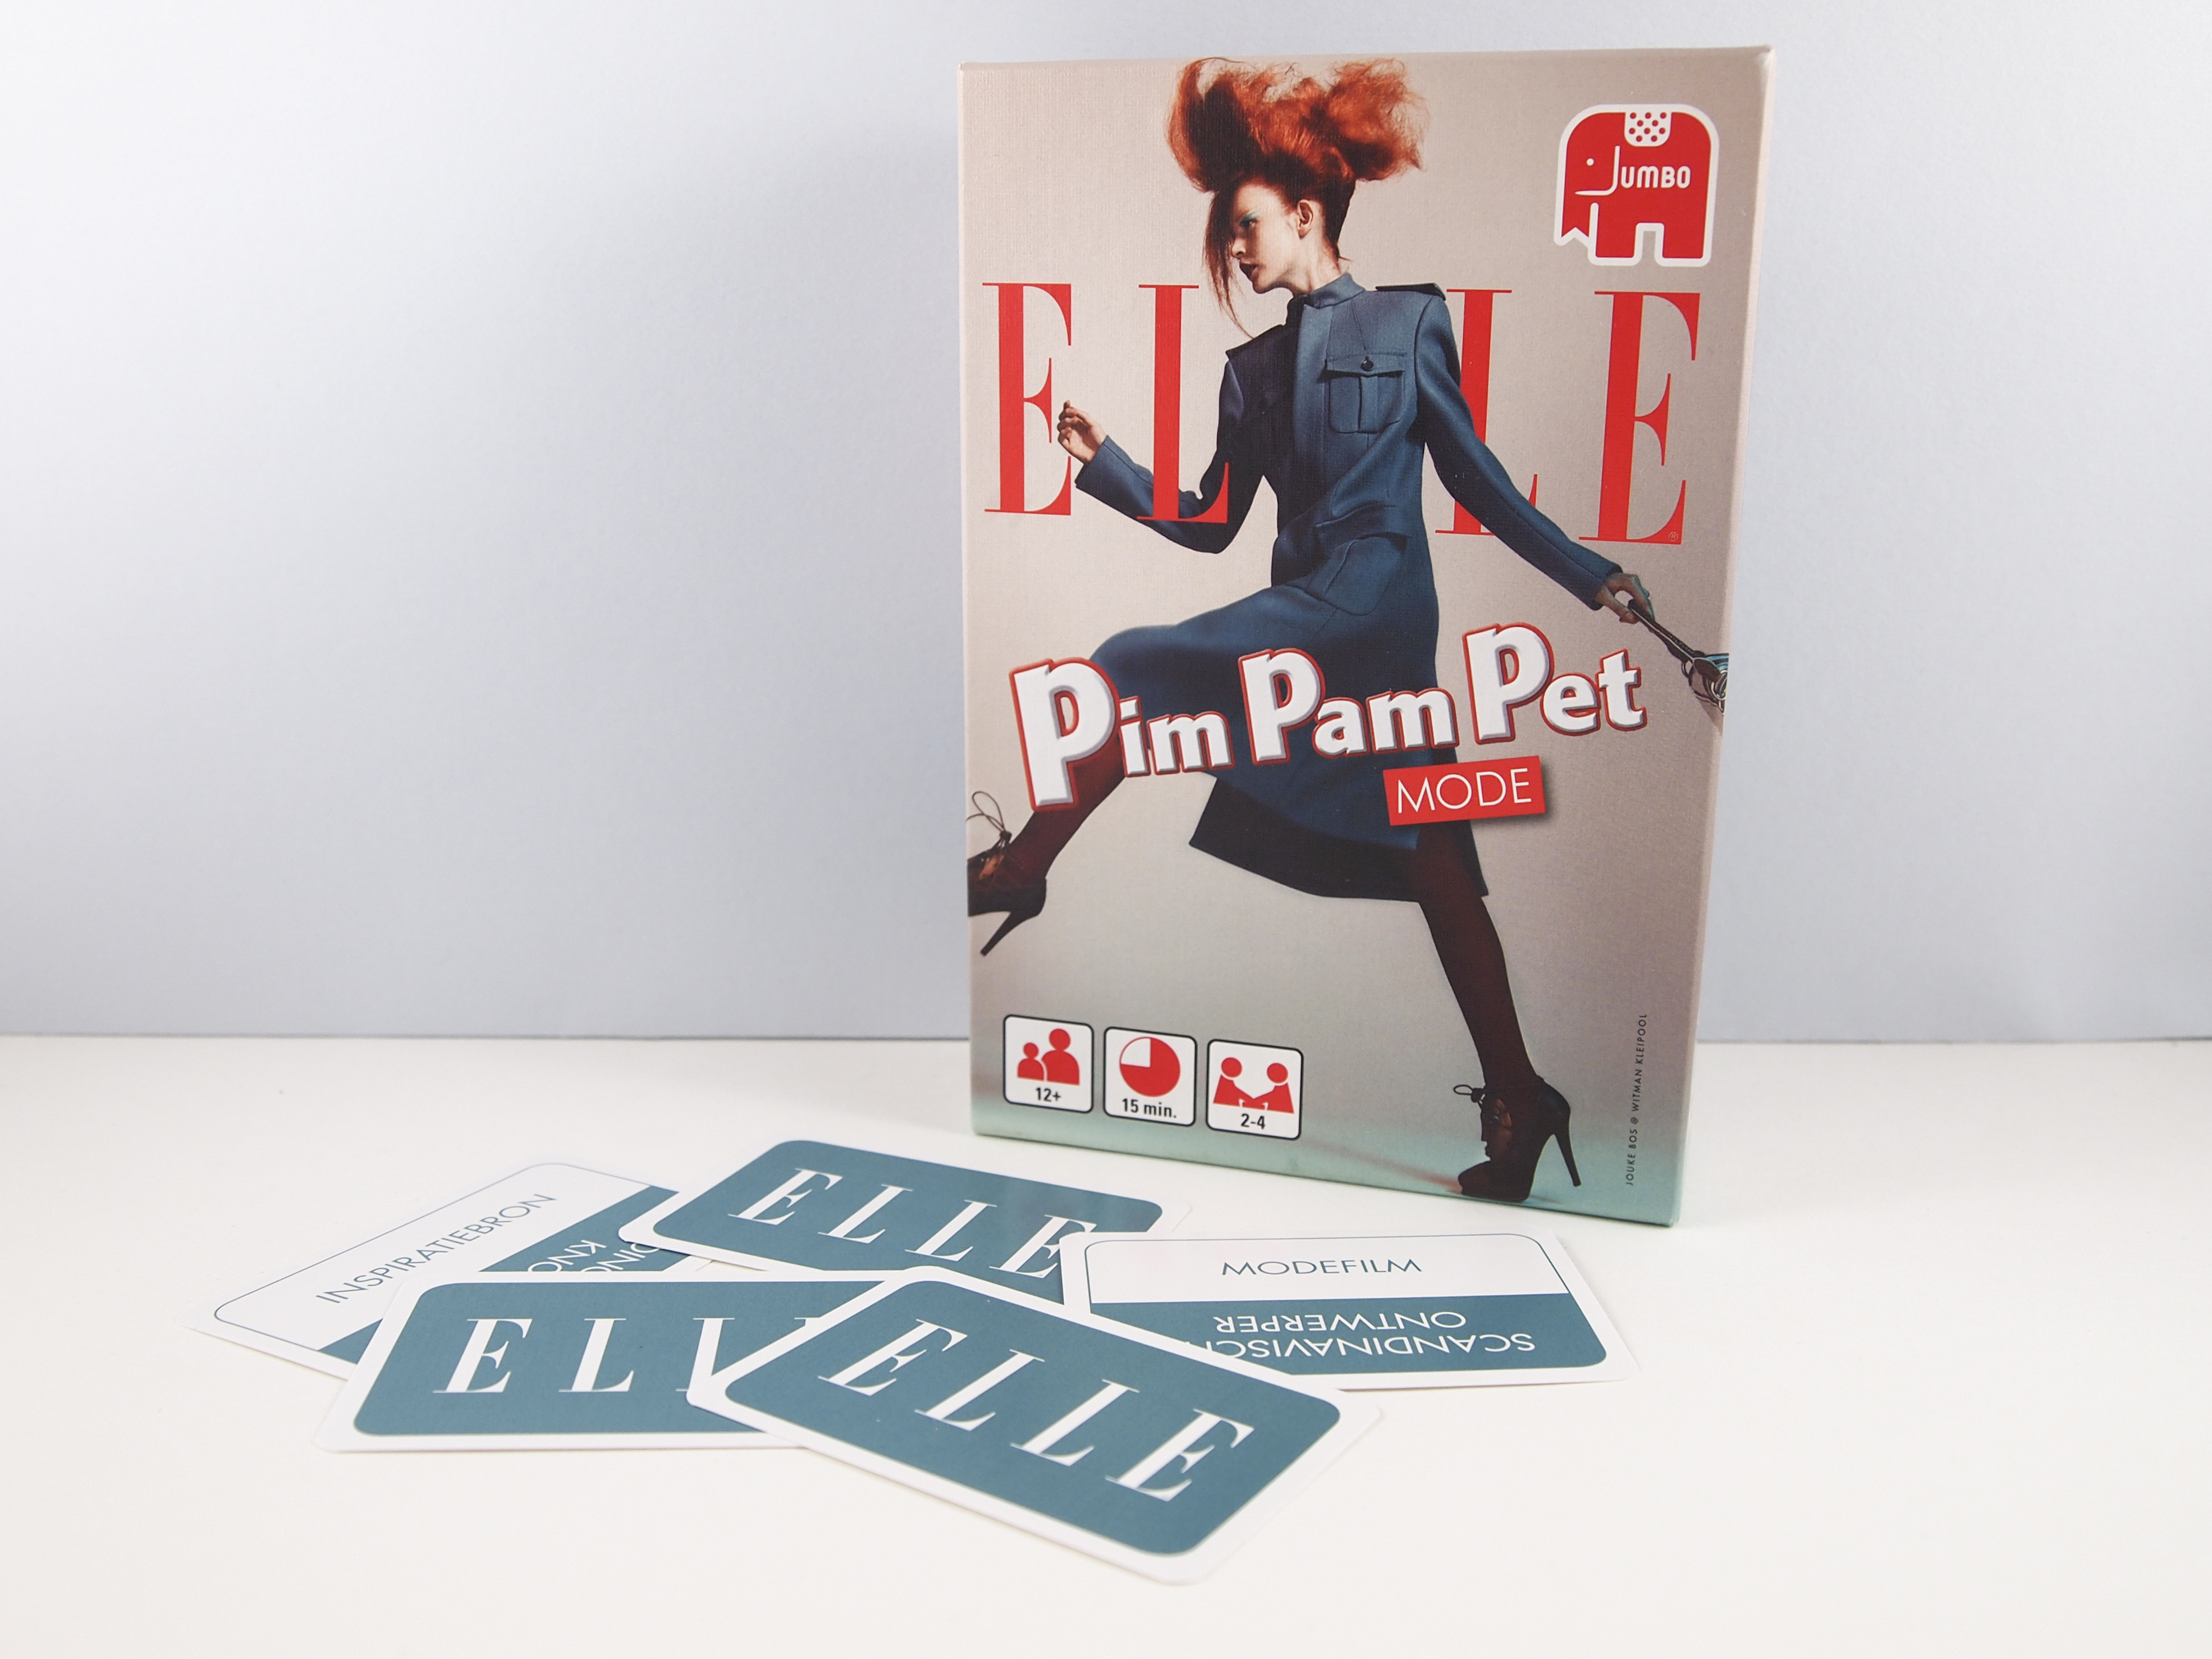 ELLE PIM PAM PET GAME